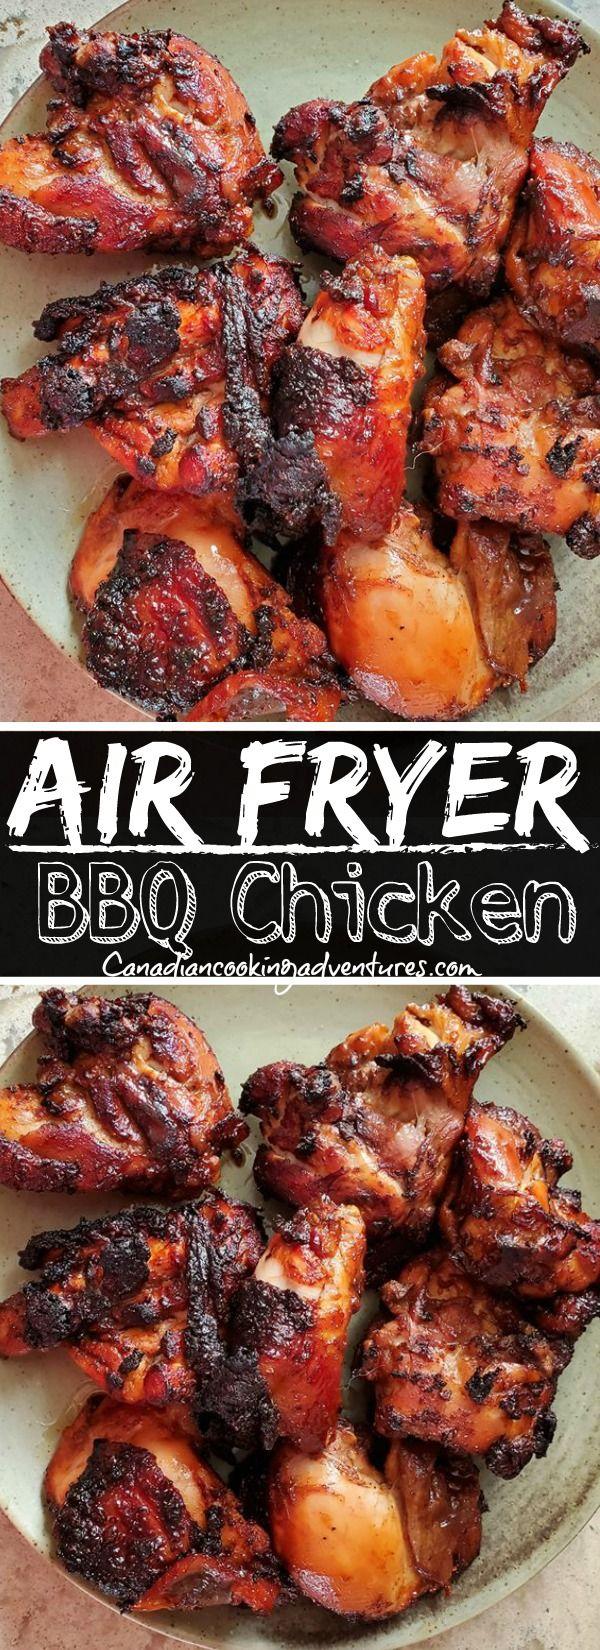 Air Fryer Bbq Chicken in 2020 Air fryer recipes easy